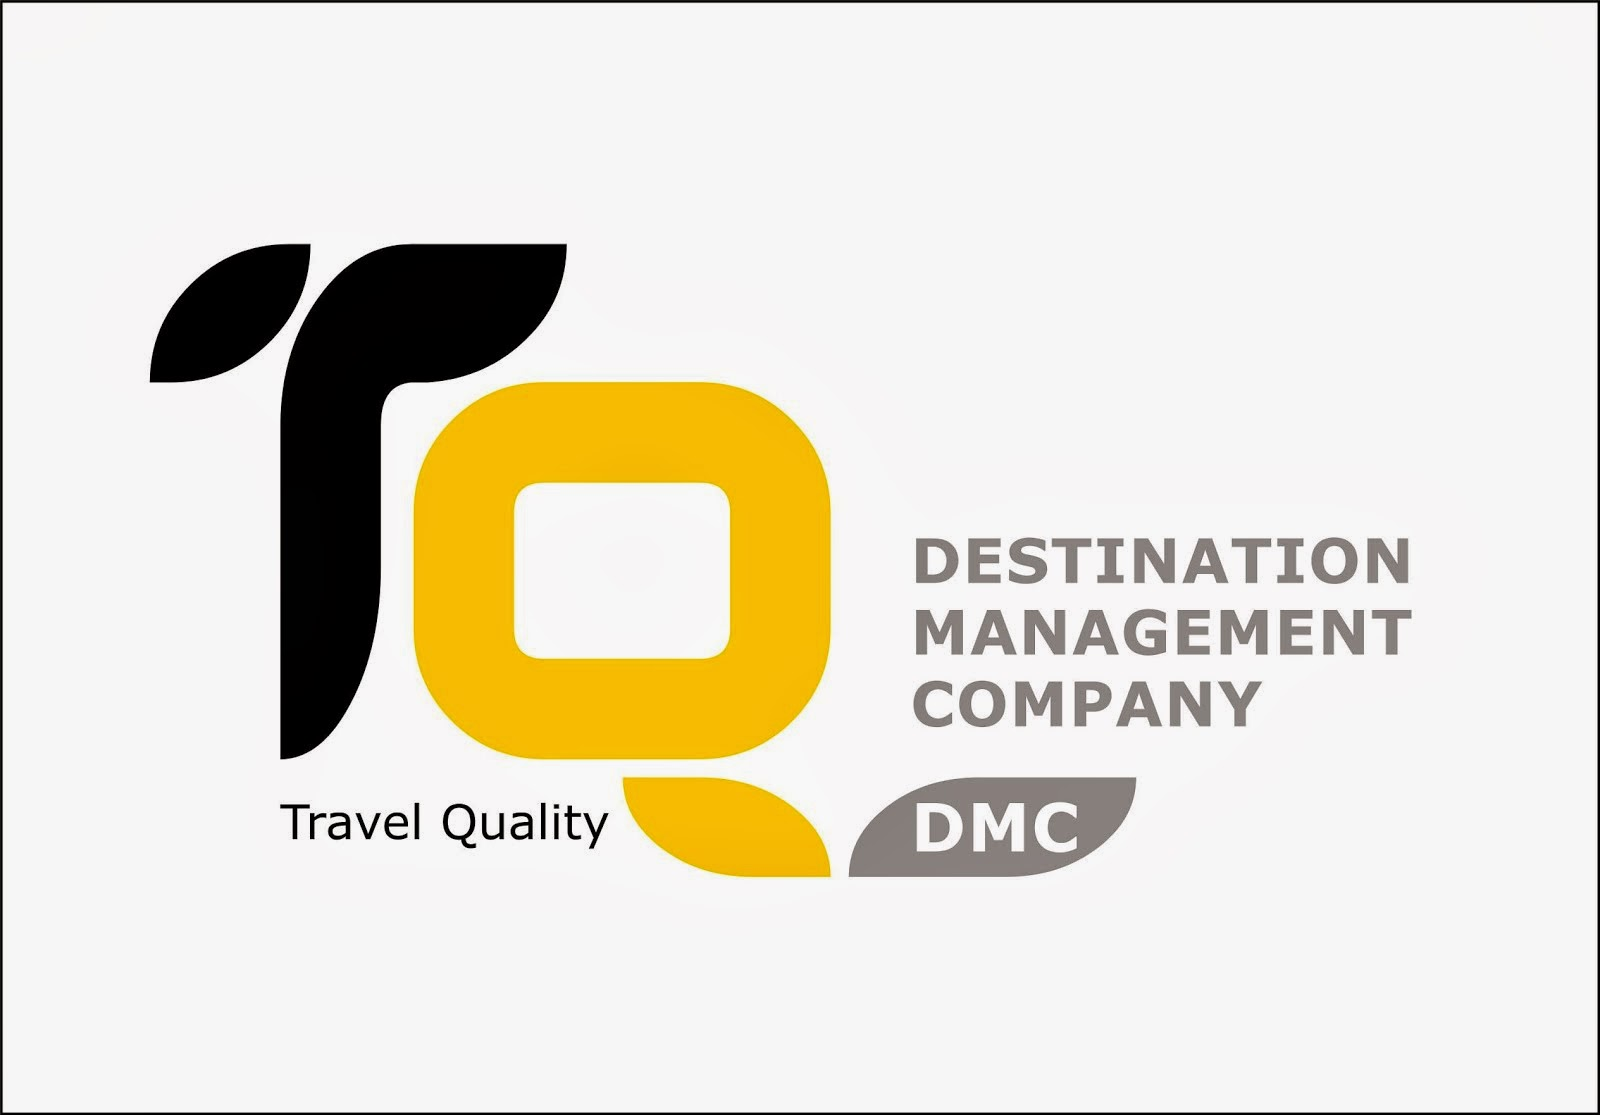 Travel Quality